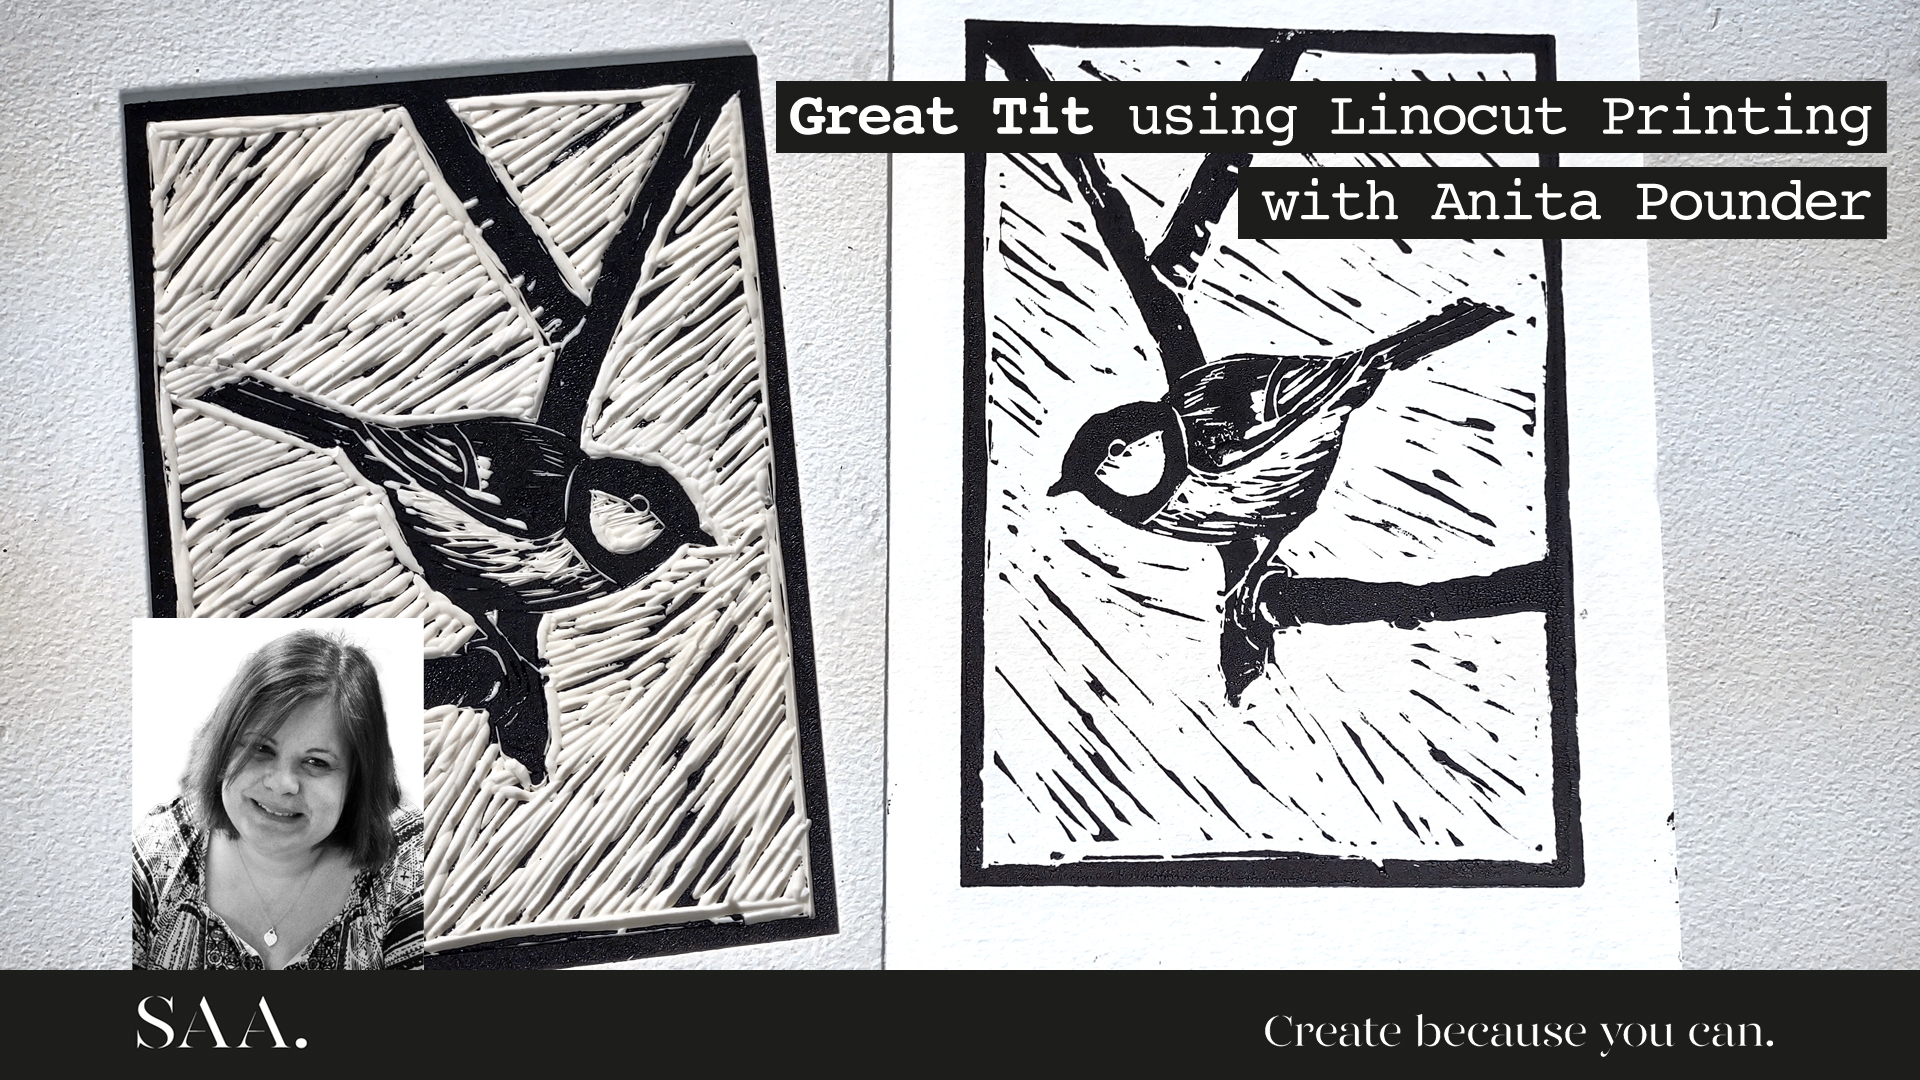 Tuiton – Great Tit using Linocut Print with Anita Pounder